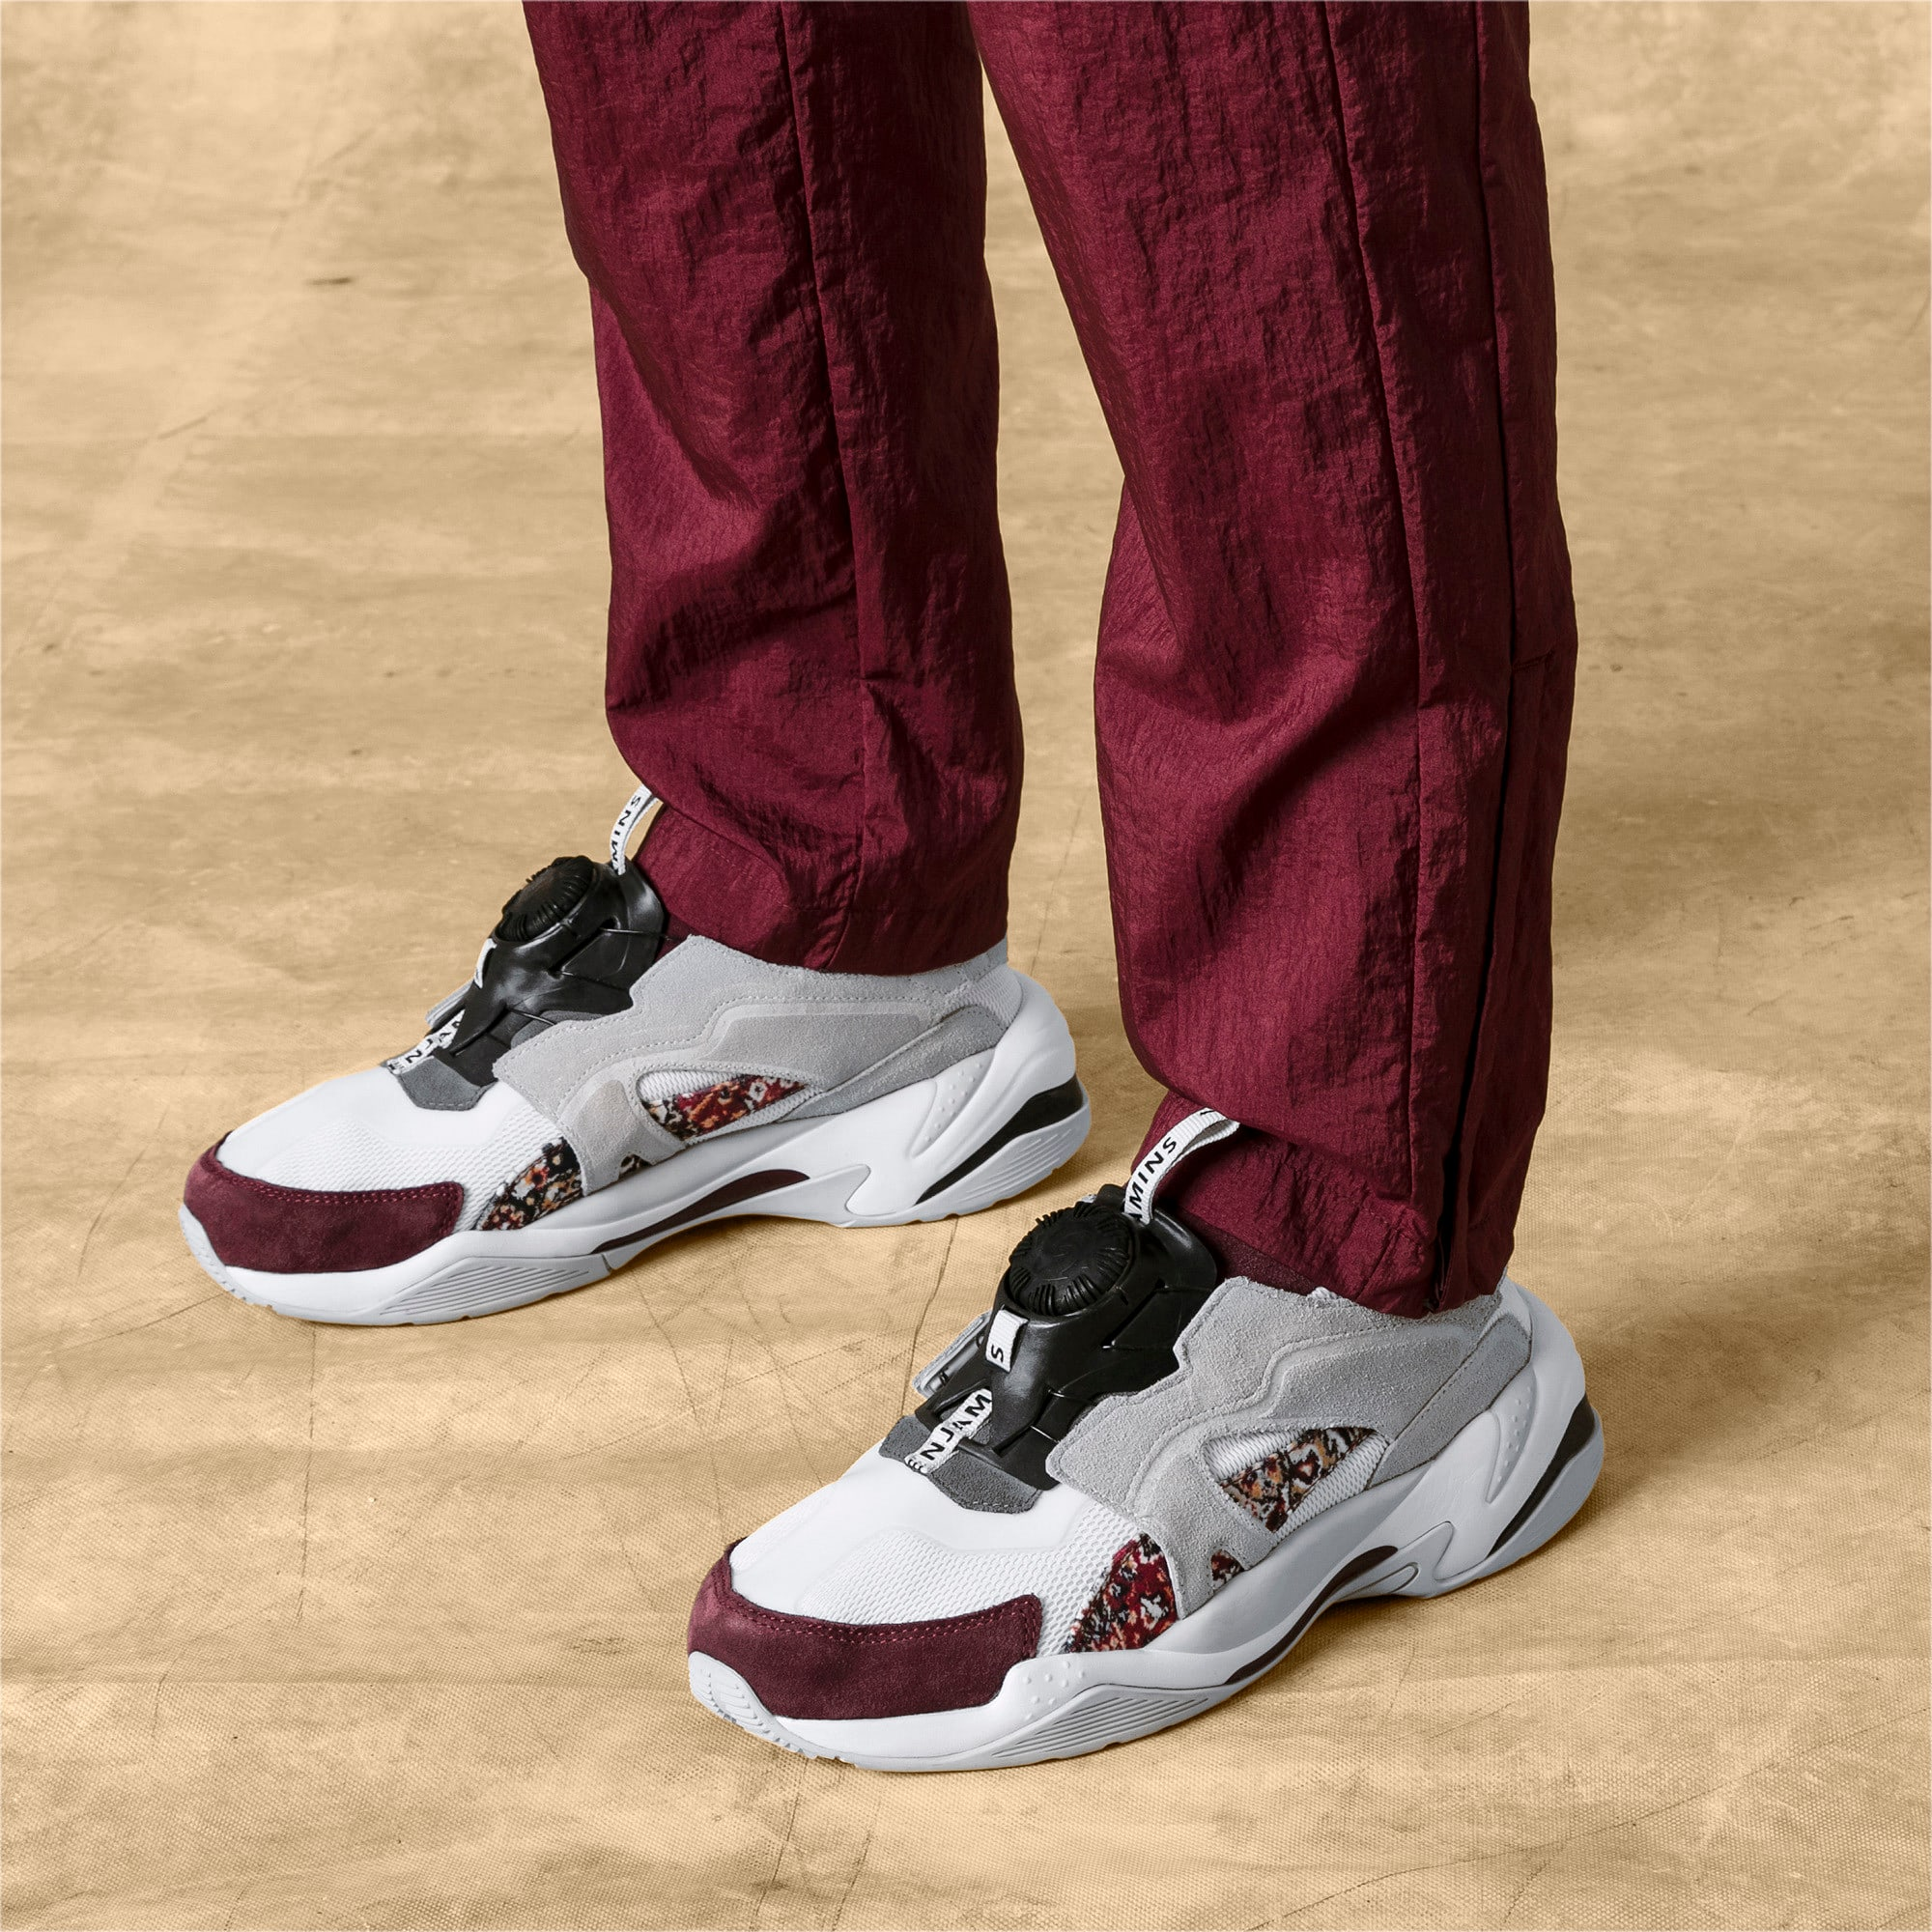 Thumbnail 2 of PUMA x LES BENJAMINS Thunder DISC Men's Sneakers, Puma White-Glacier Gray, medium